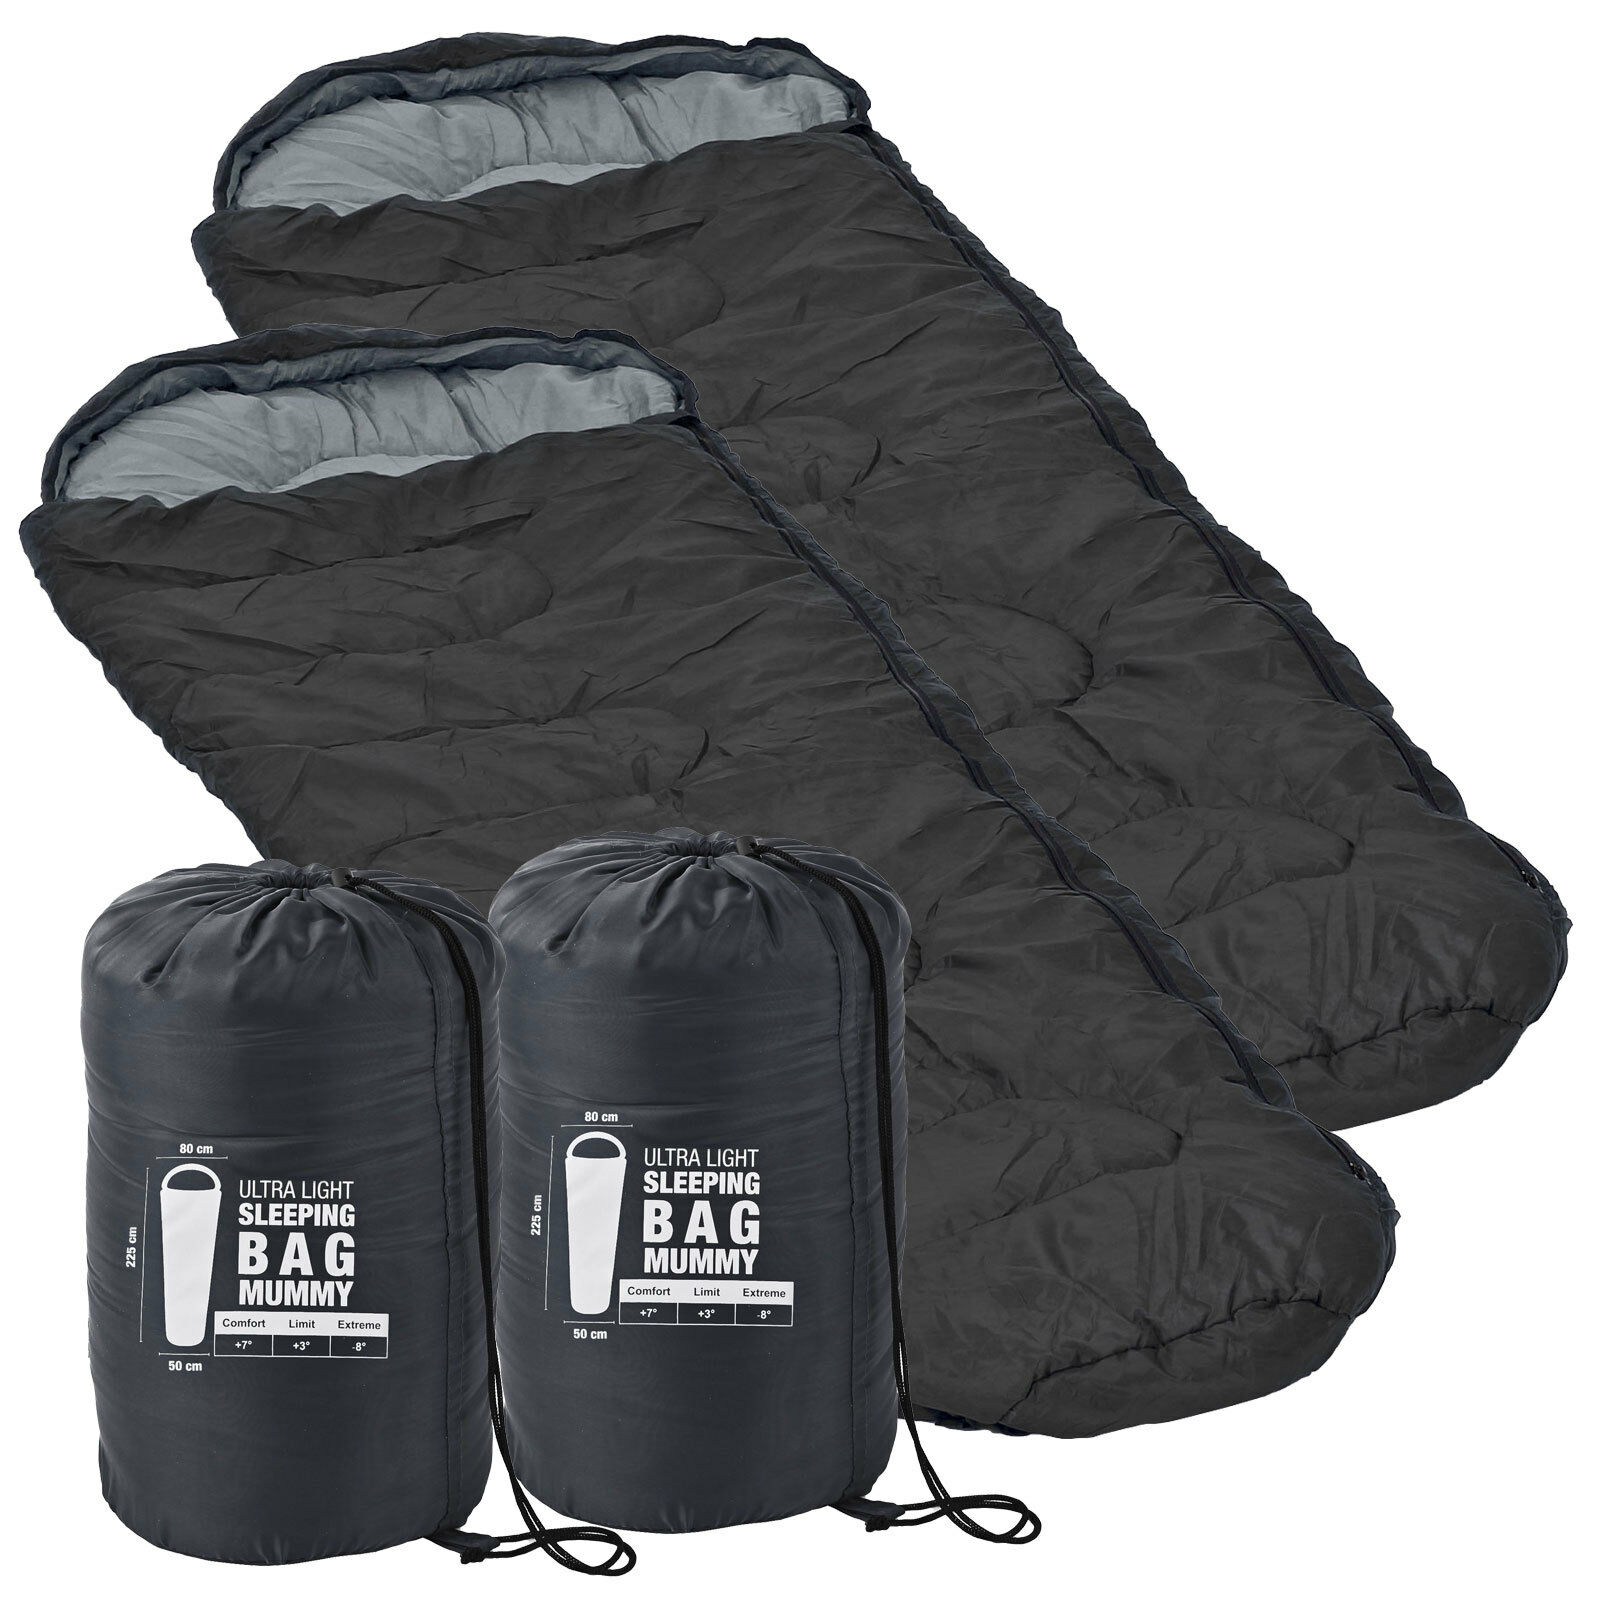 2x Ultra  Light Sleeping Bag Grey 225 x 80 x 50 minus 8 ° C NEW & OVP  hot